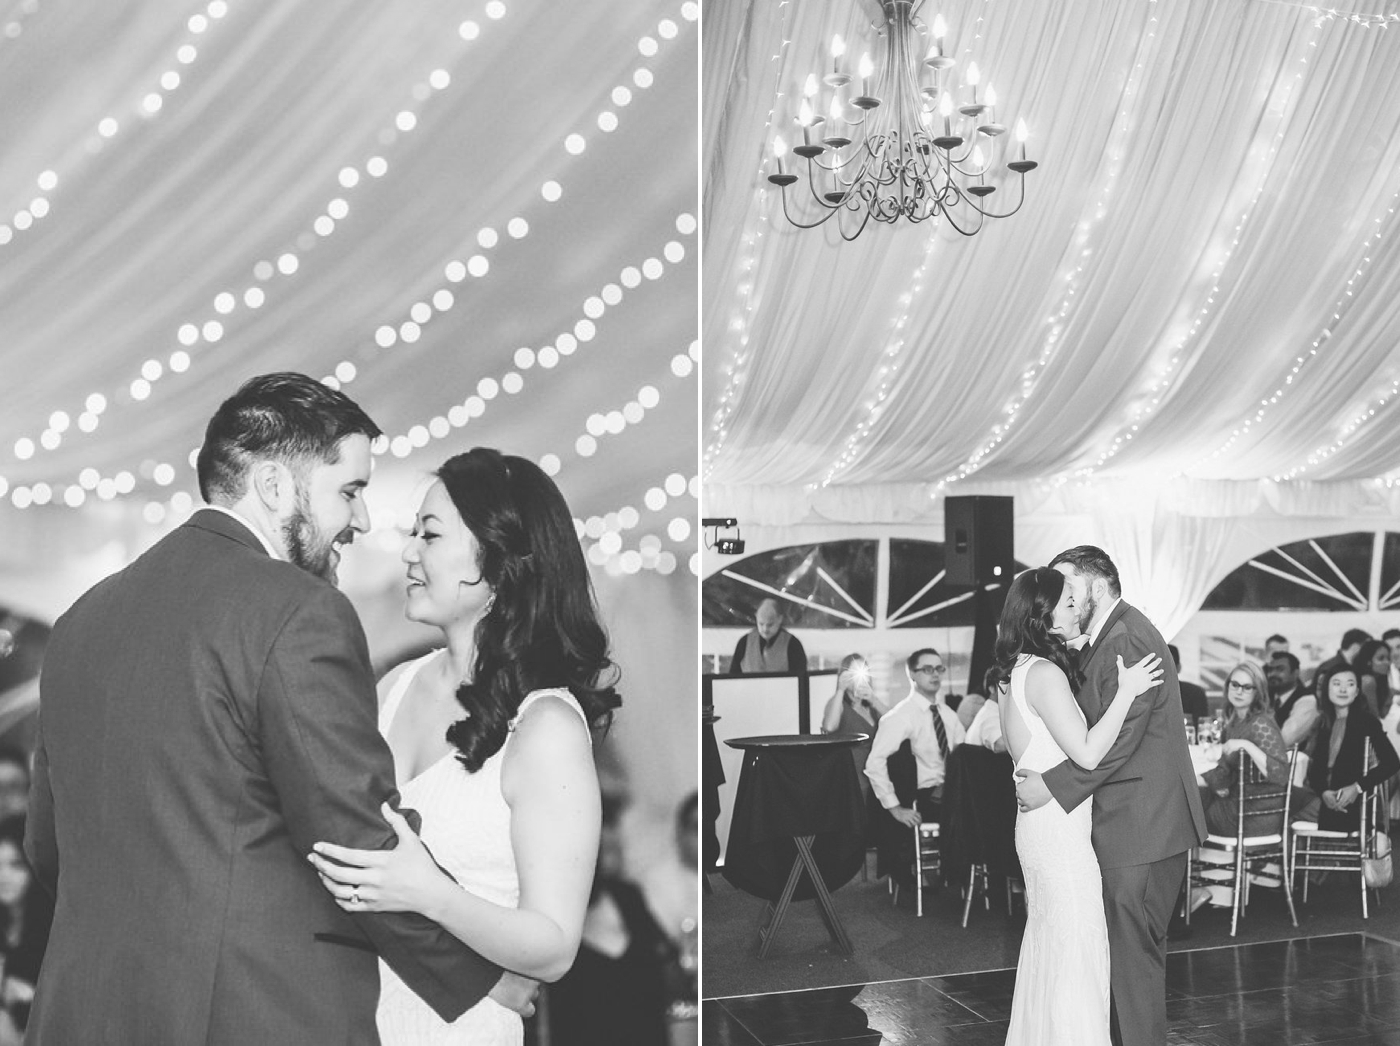 chicago-fine-art-wedding-photography-bolotin33